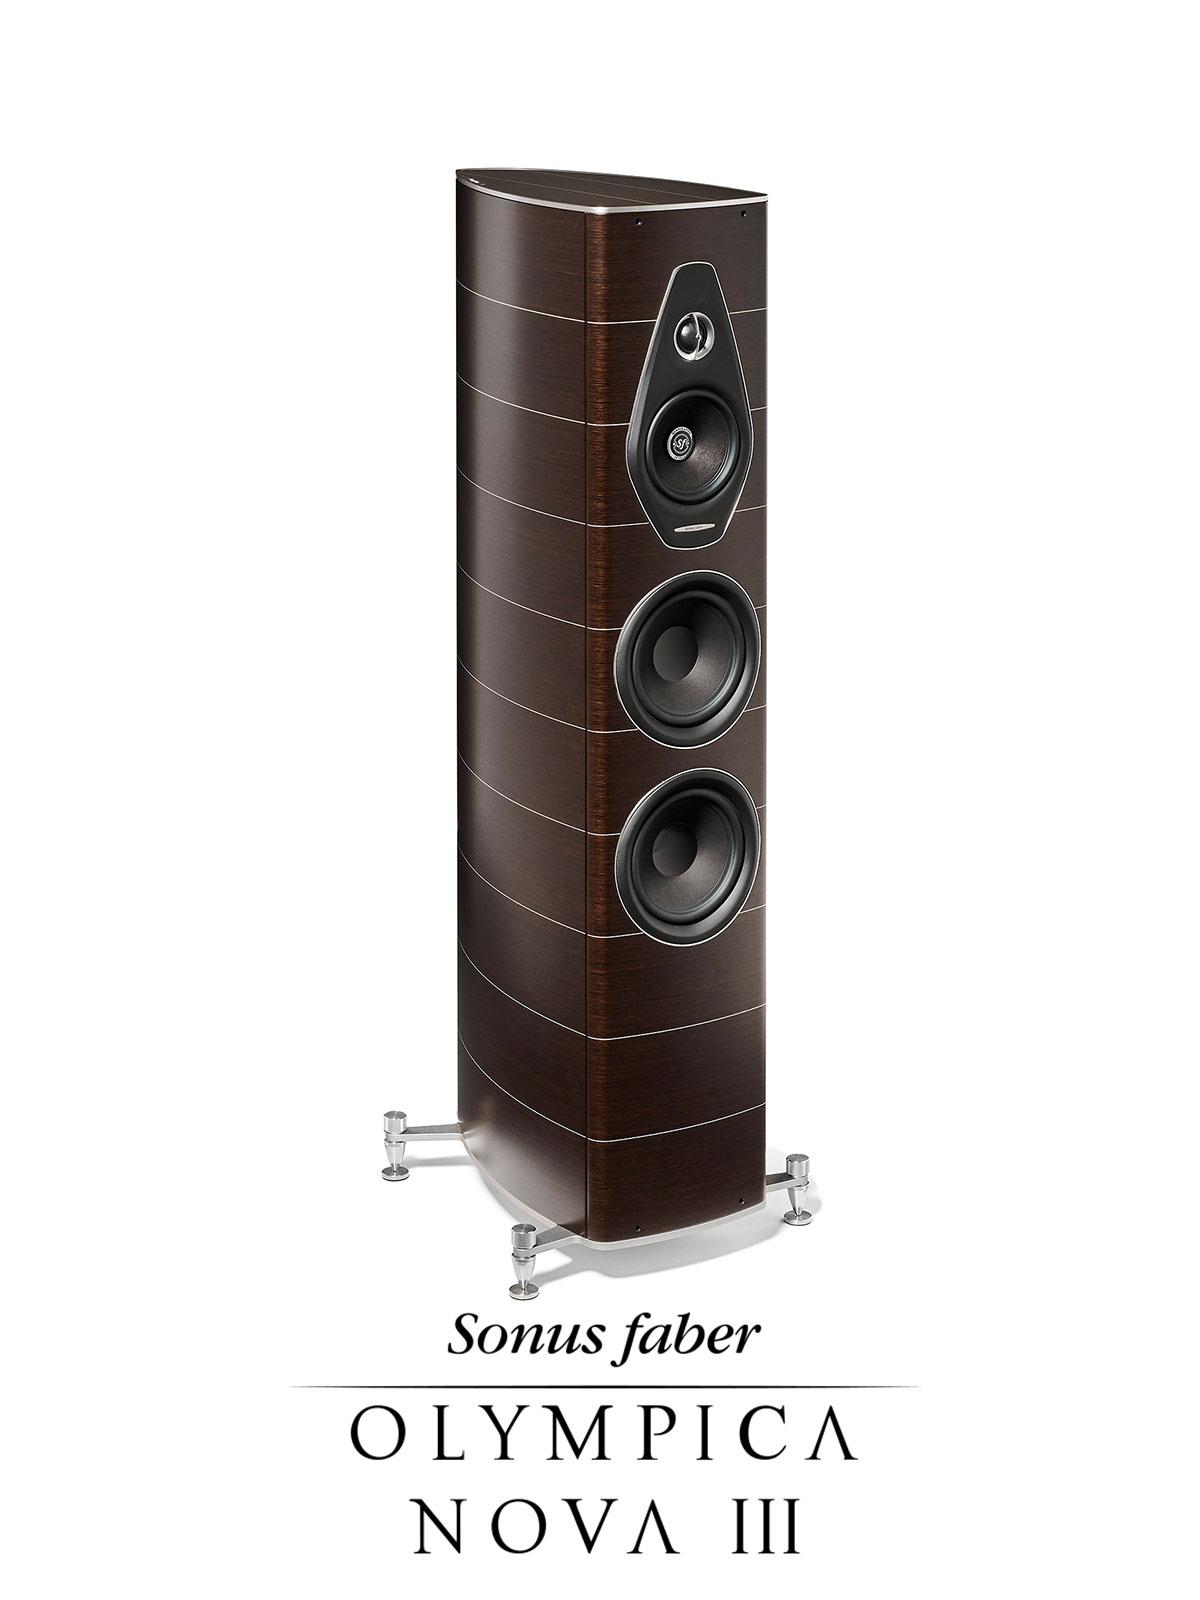 New Luxury Stand Loudspeaker Olympica Nova III | Sonus faber